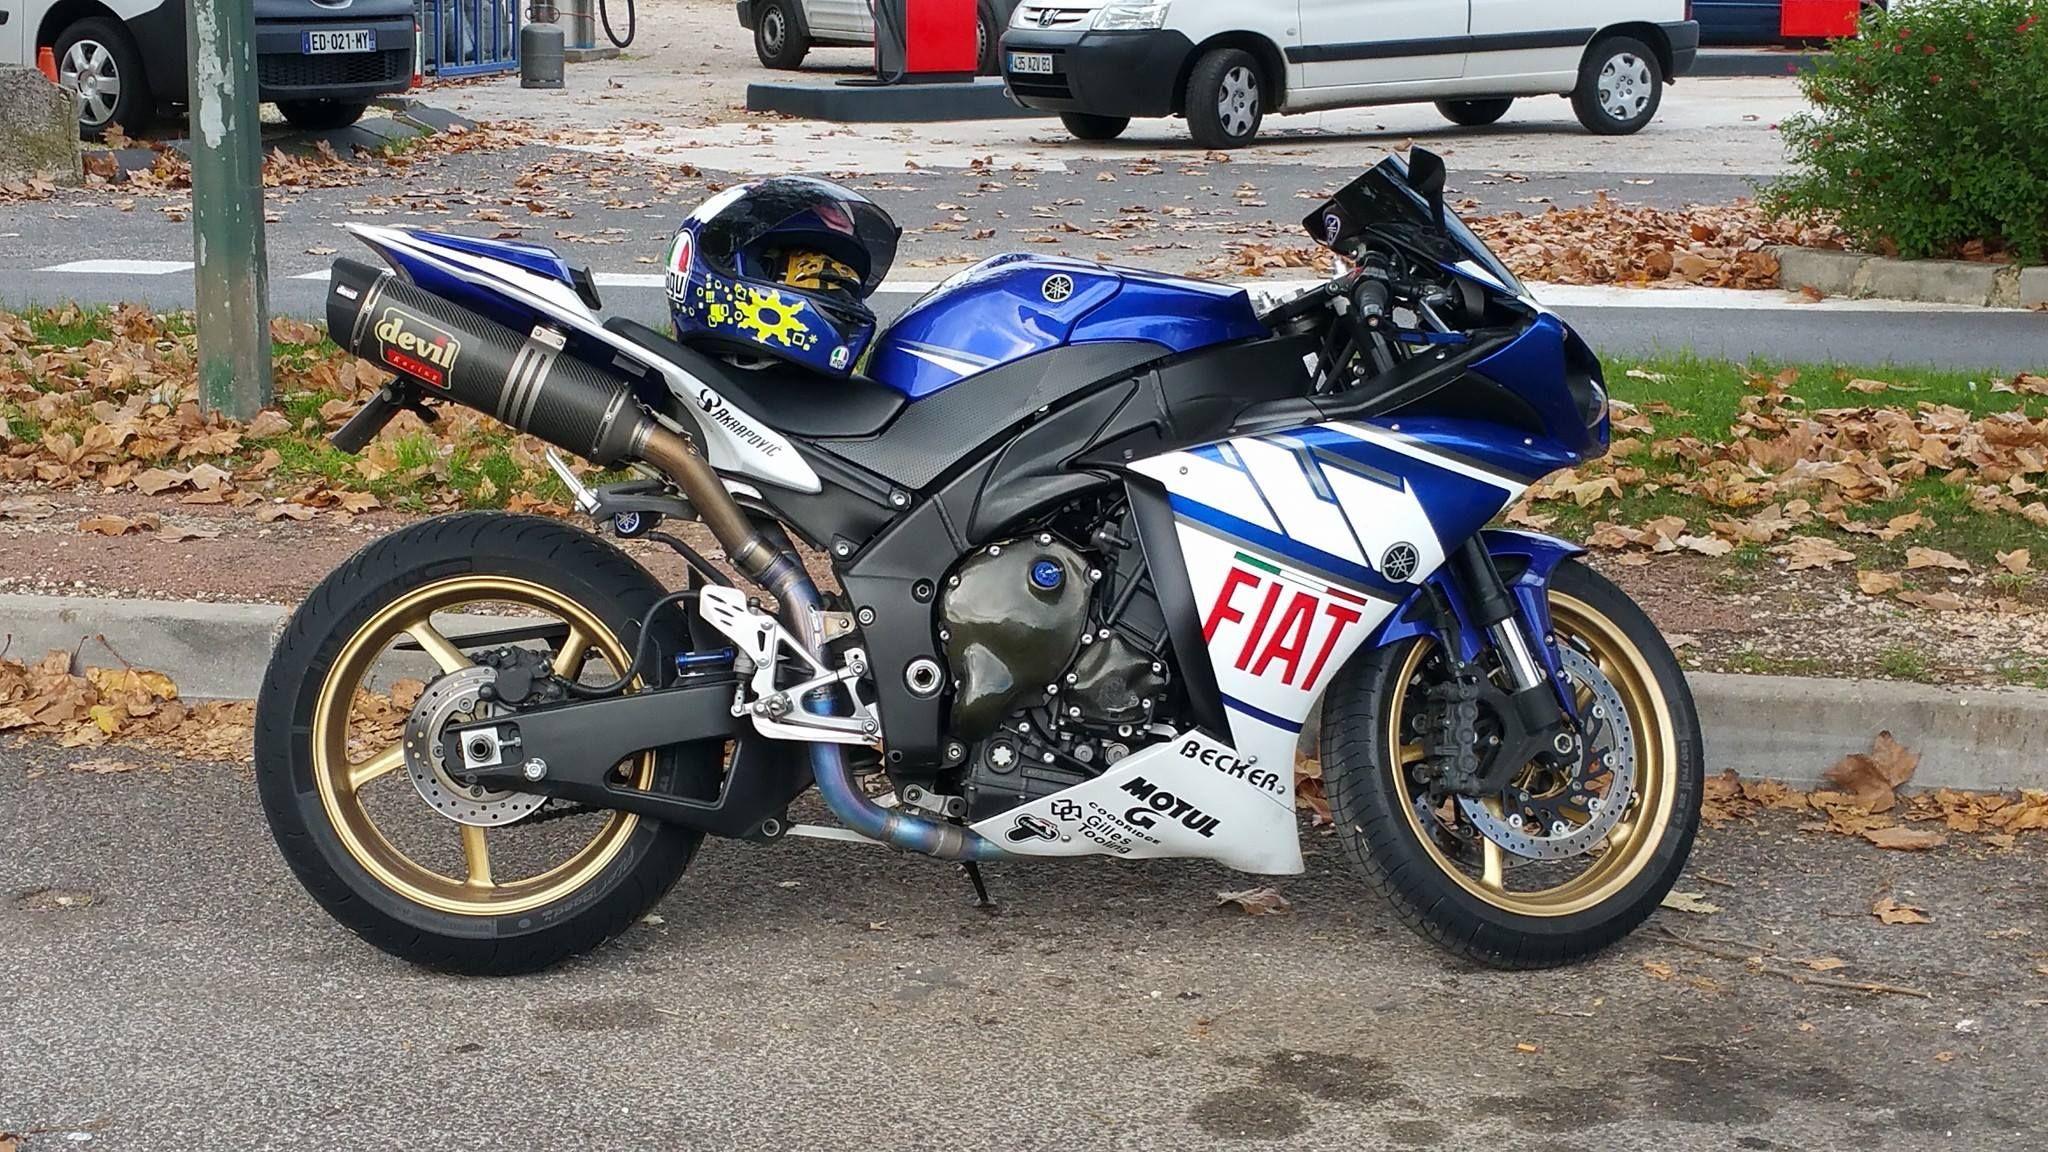 hight resolution of 2011 yamaha r1 blue fiat devil exhaust